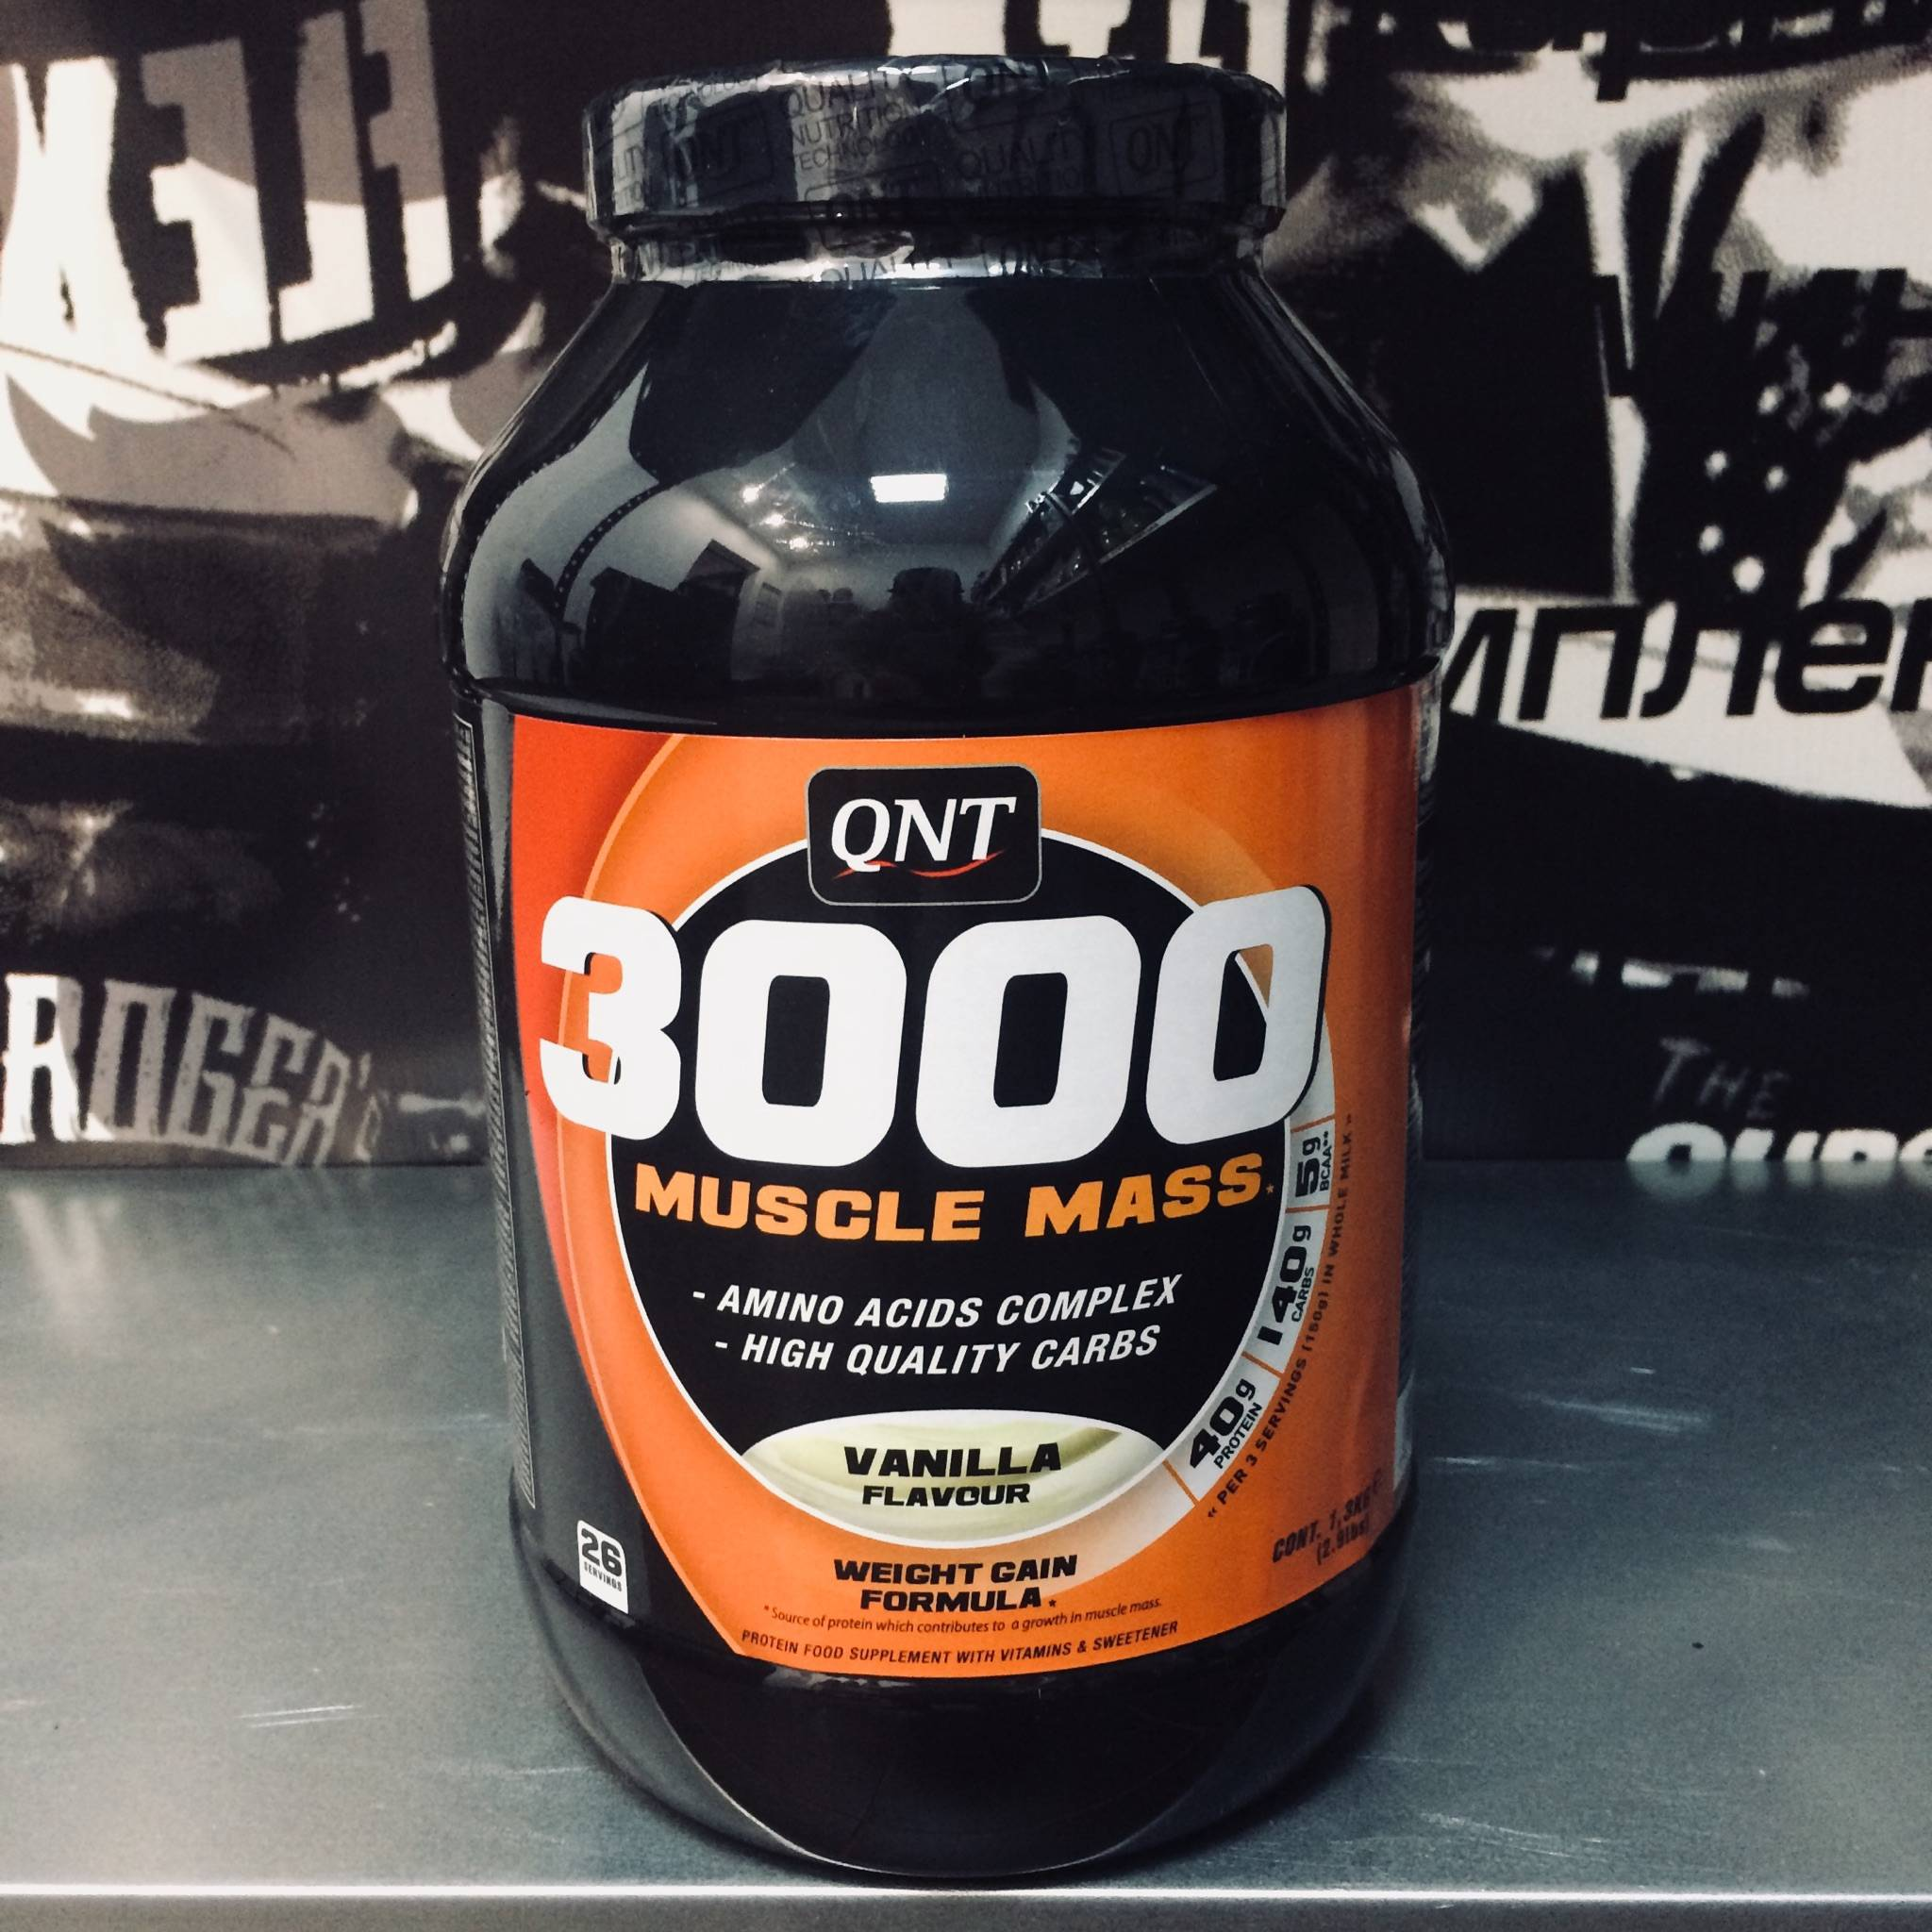 Muscle juice revolution 2600 от ultimate nutrition: как принимать, состав